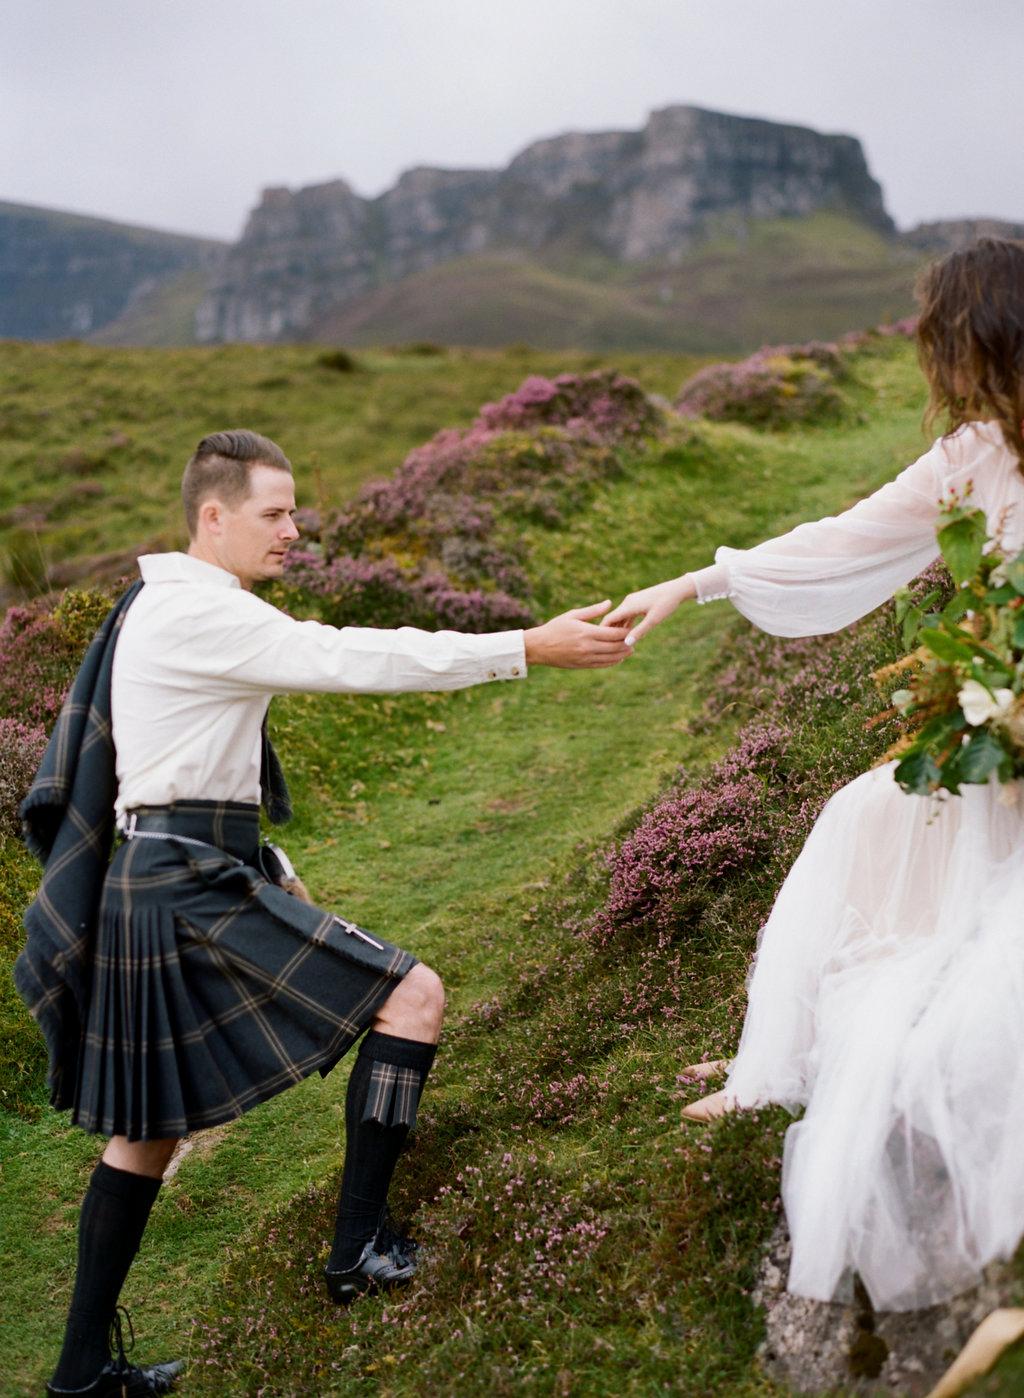 Scotland-Prewedding-highlands-castle-Engagment-Photos-Katie-Grant (24 of 139).jpg